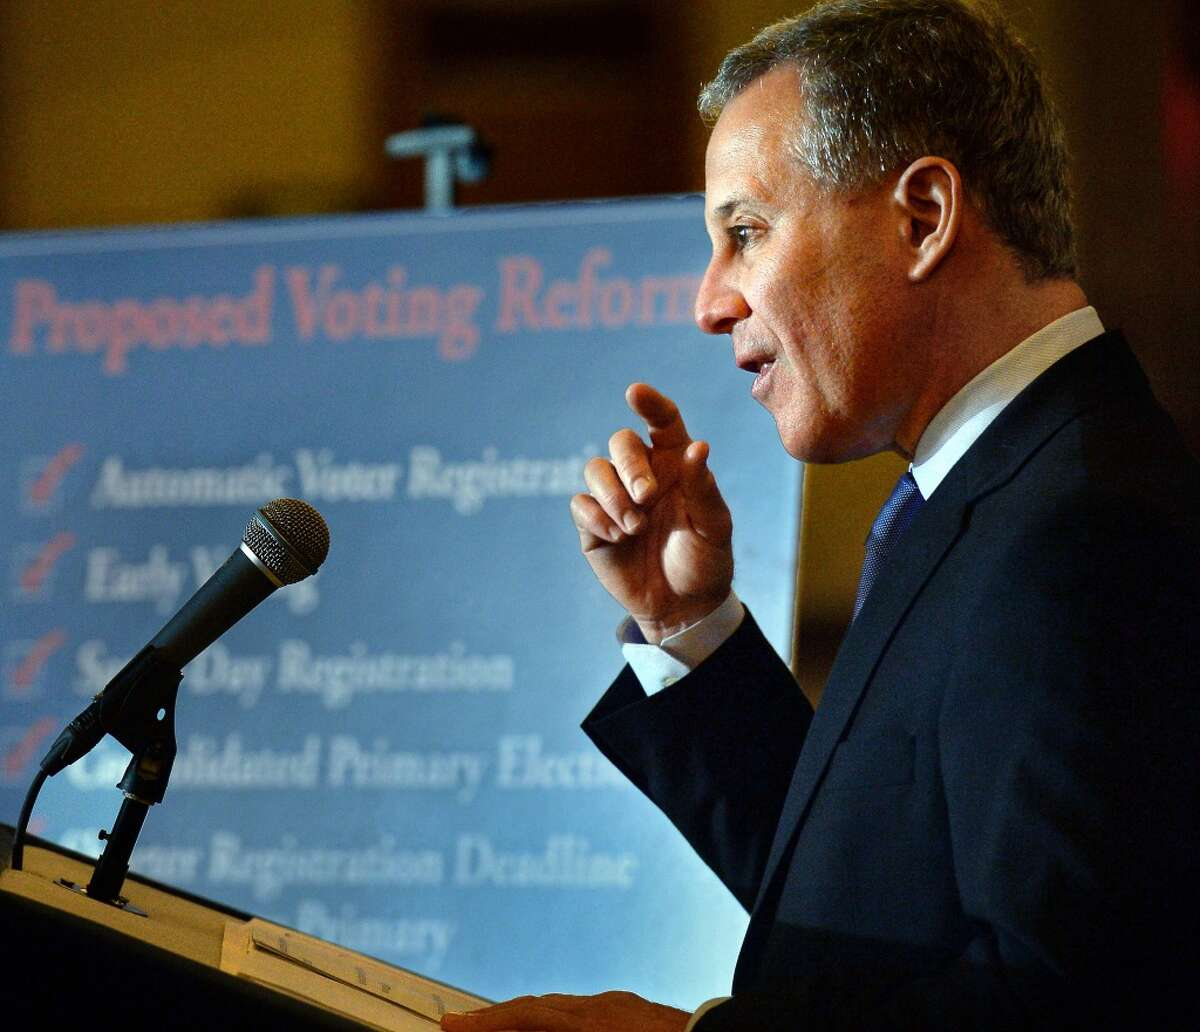 Attorney General Eric Schneiderman faces election in 2018.